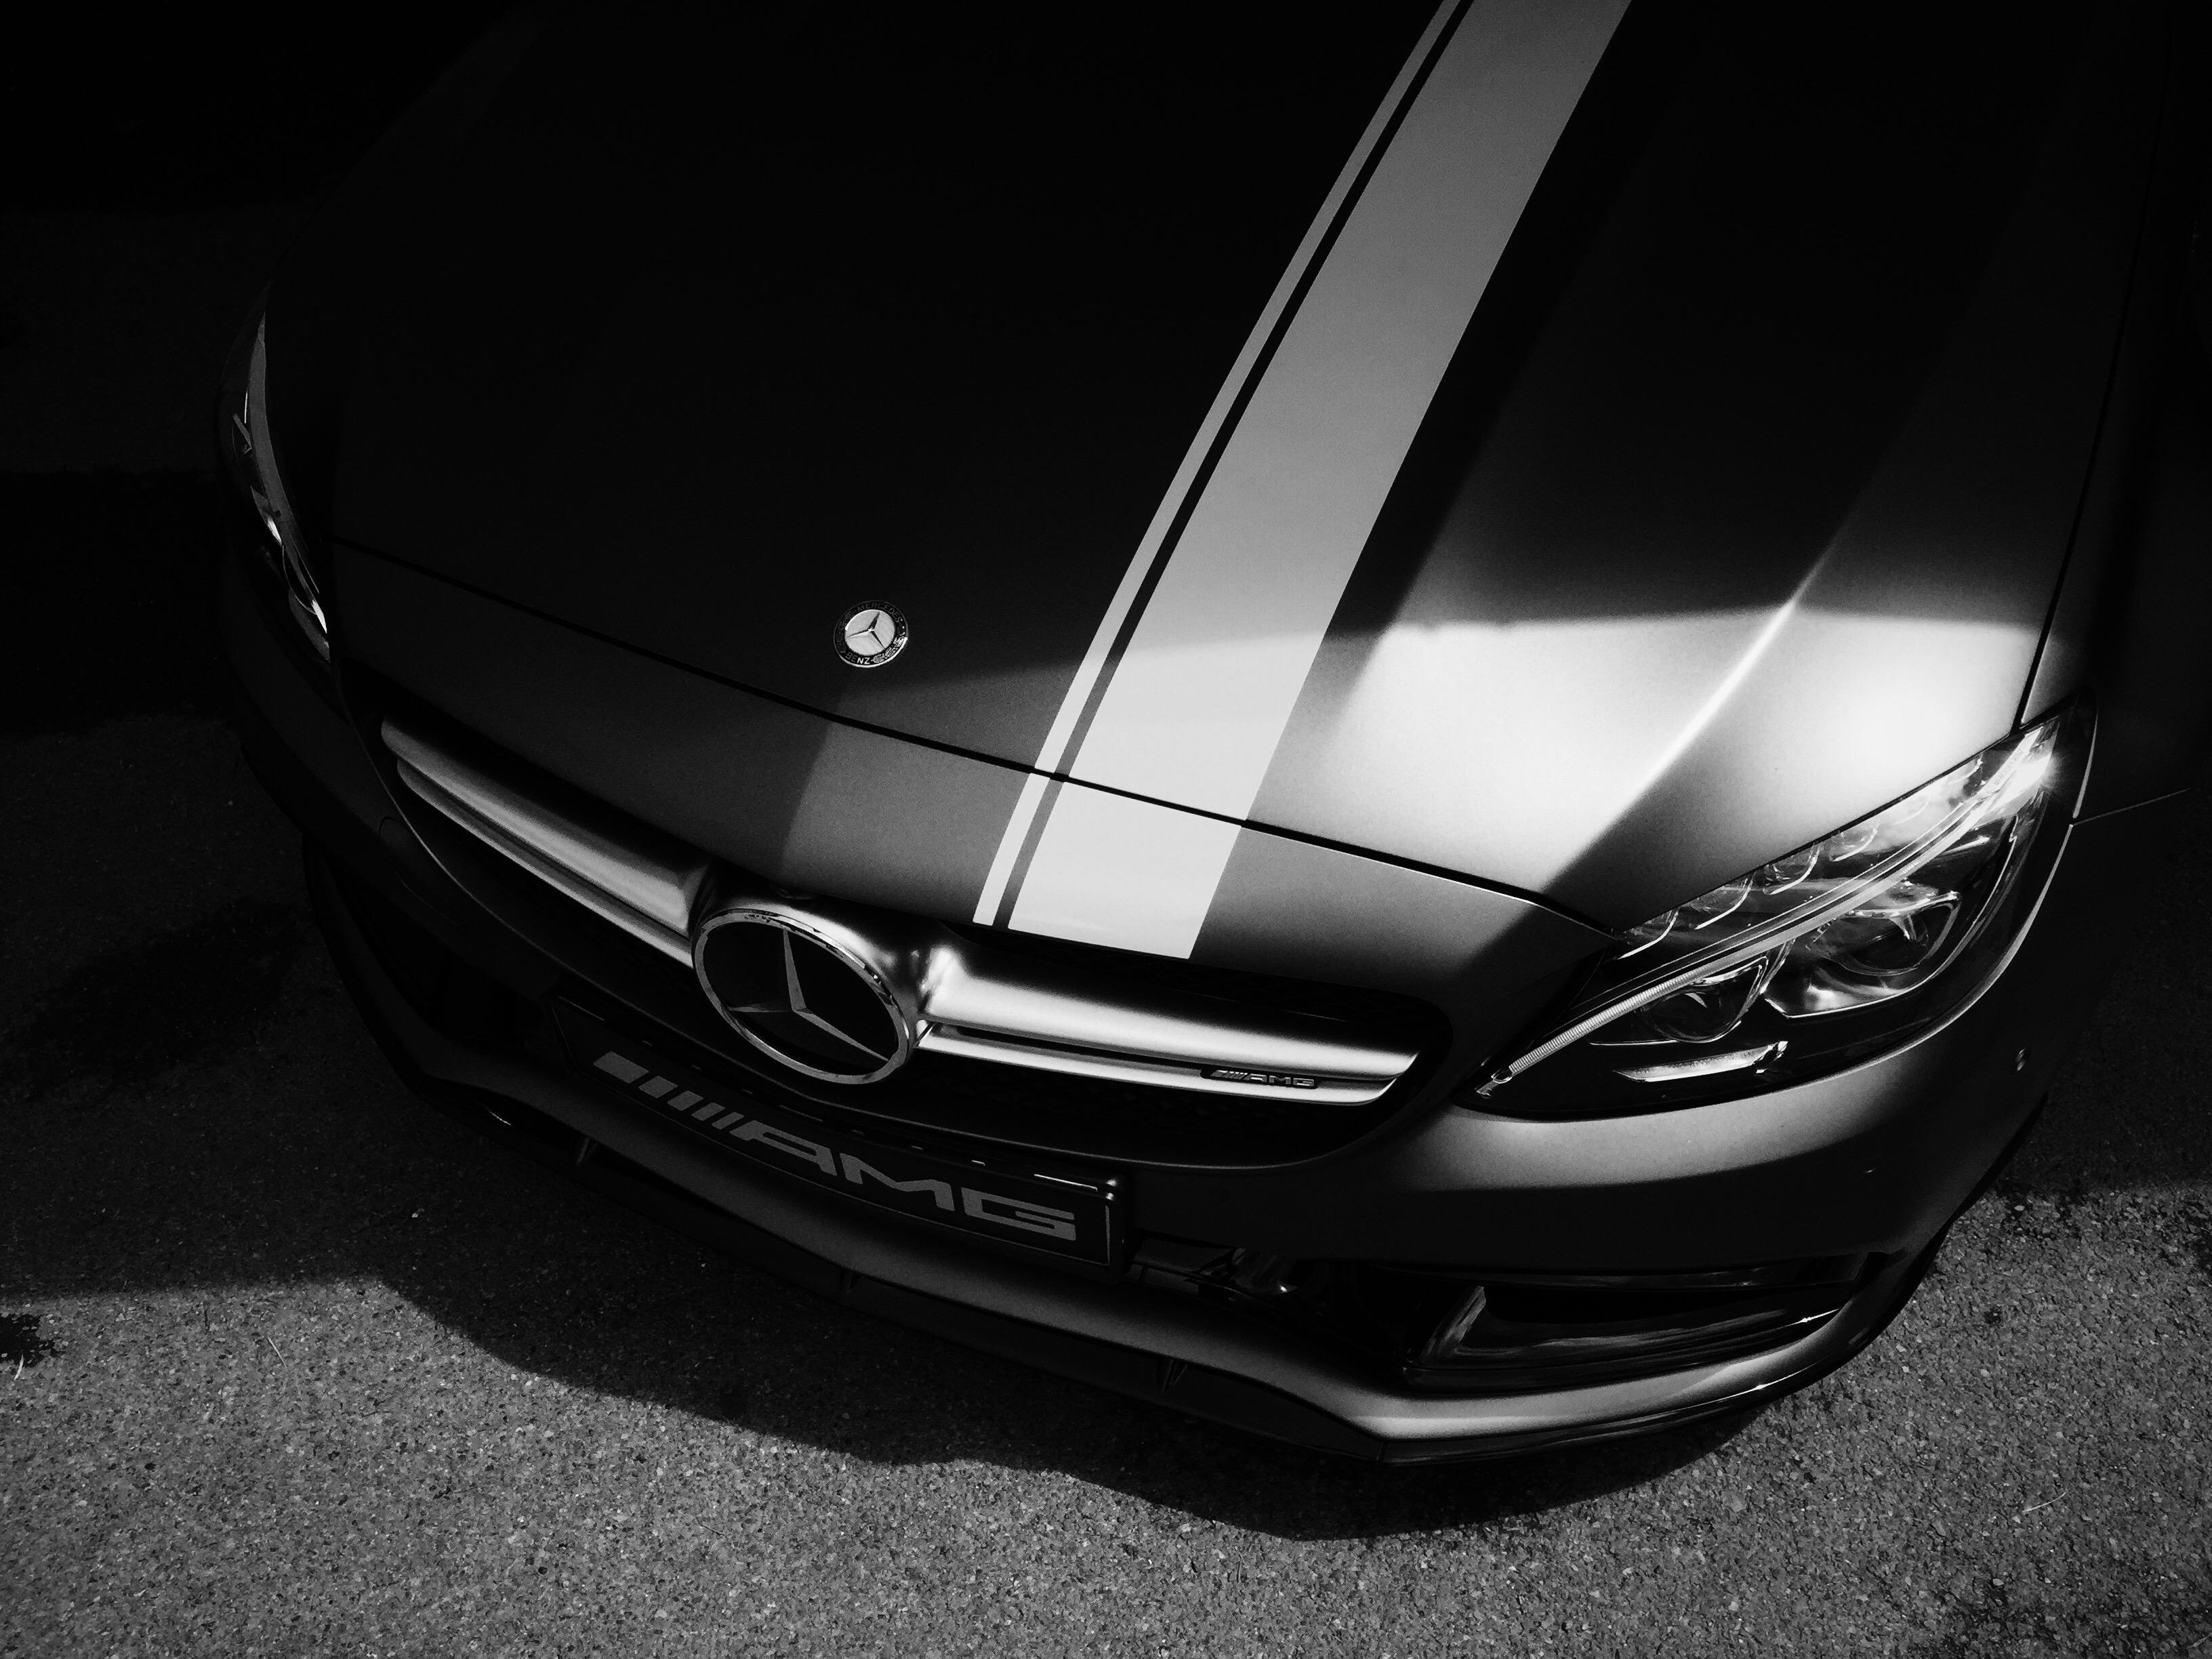 Wallpaper satu warna kap Mercedes Benz Mobil sport